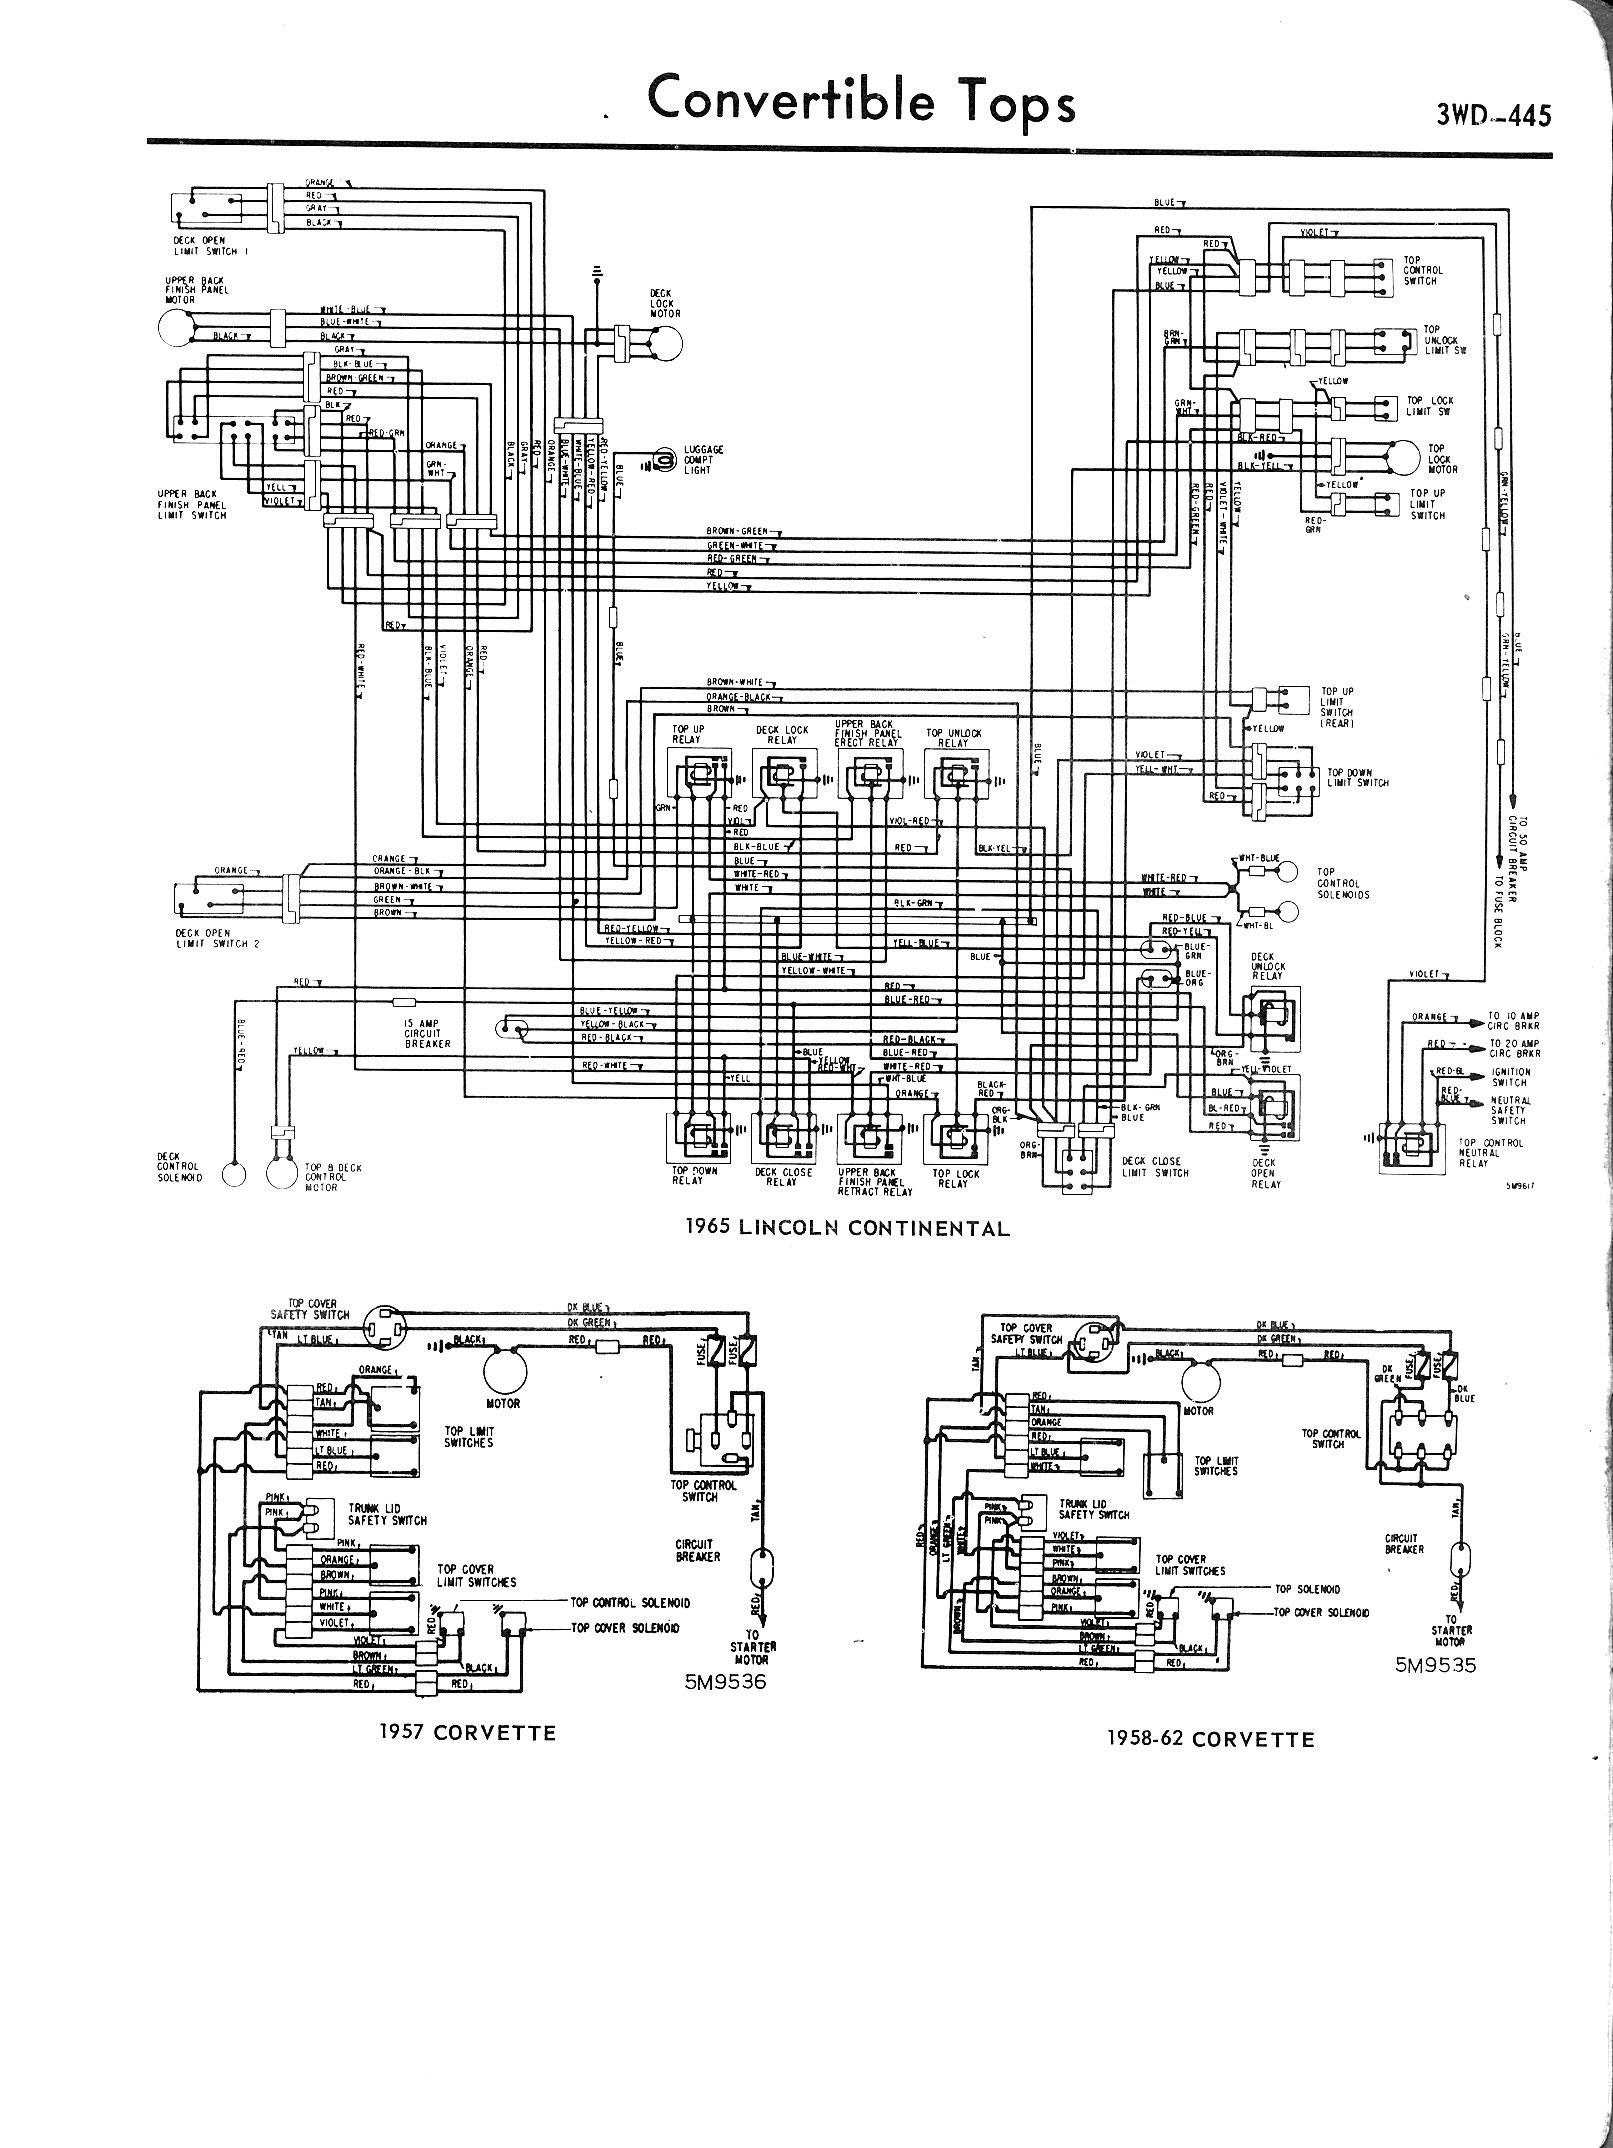 Brilliant 1957 Chevy Corvette Wiring Diagrams Diagram Data Schema Wiring Cloud Gufailluminateatxorg